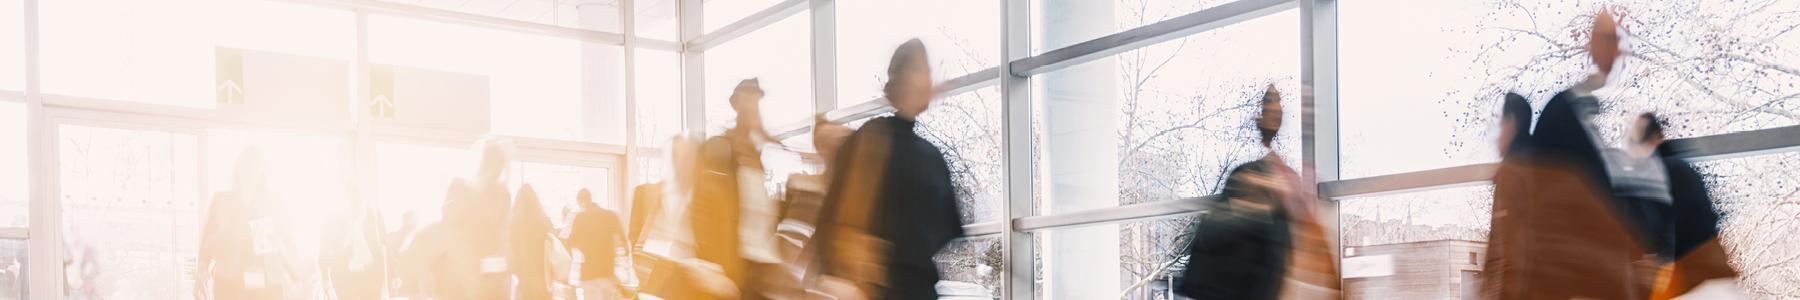 November 2020 Employee Spotlight: Adam Steck Thumbnail